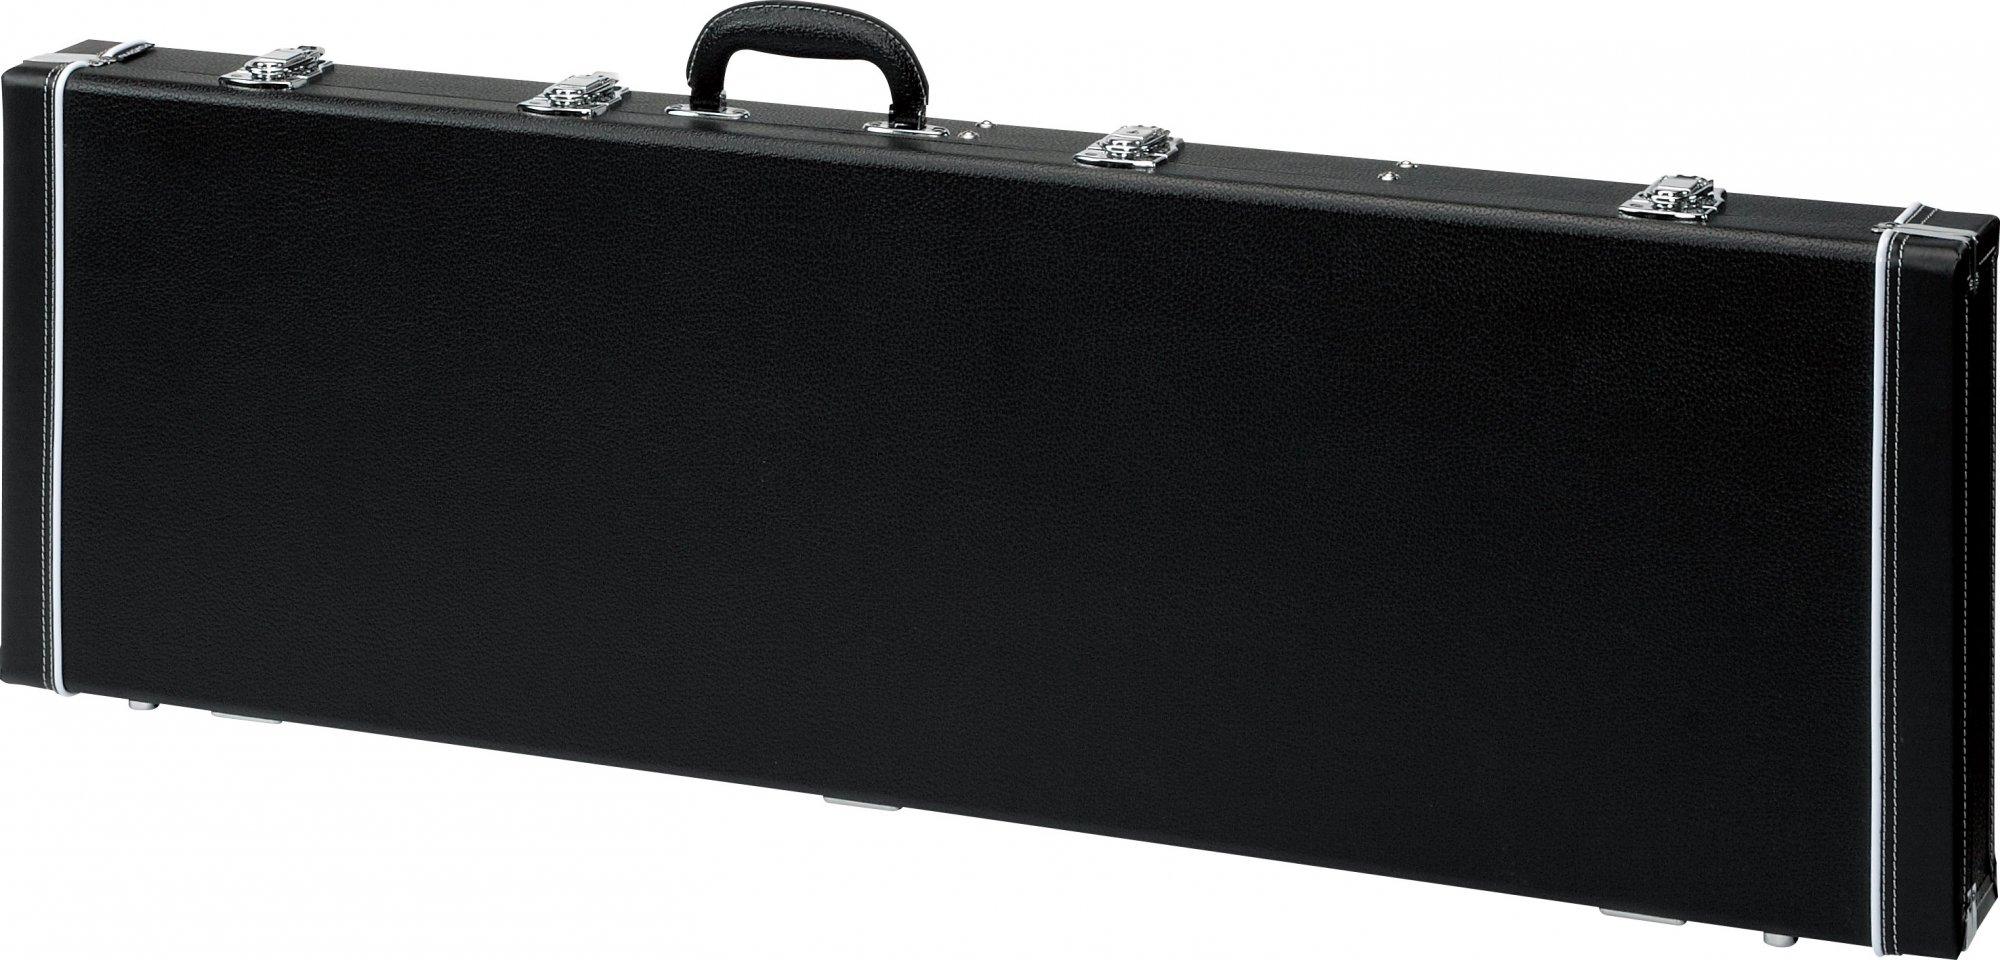 Ibanez W250C Guitar Case for all RG, RGIM, RGIB, RGD, FR, S, SA, RC, TM, NDM, Left-handed models (except RG9)